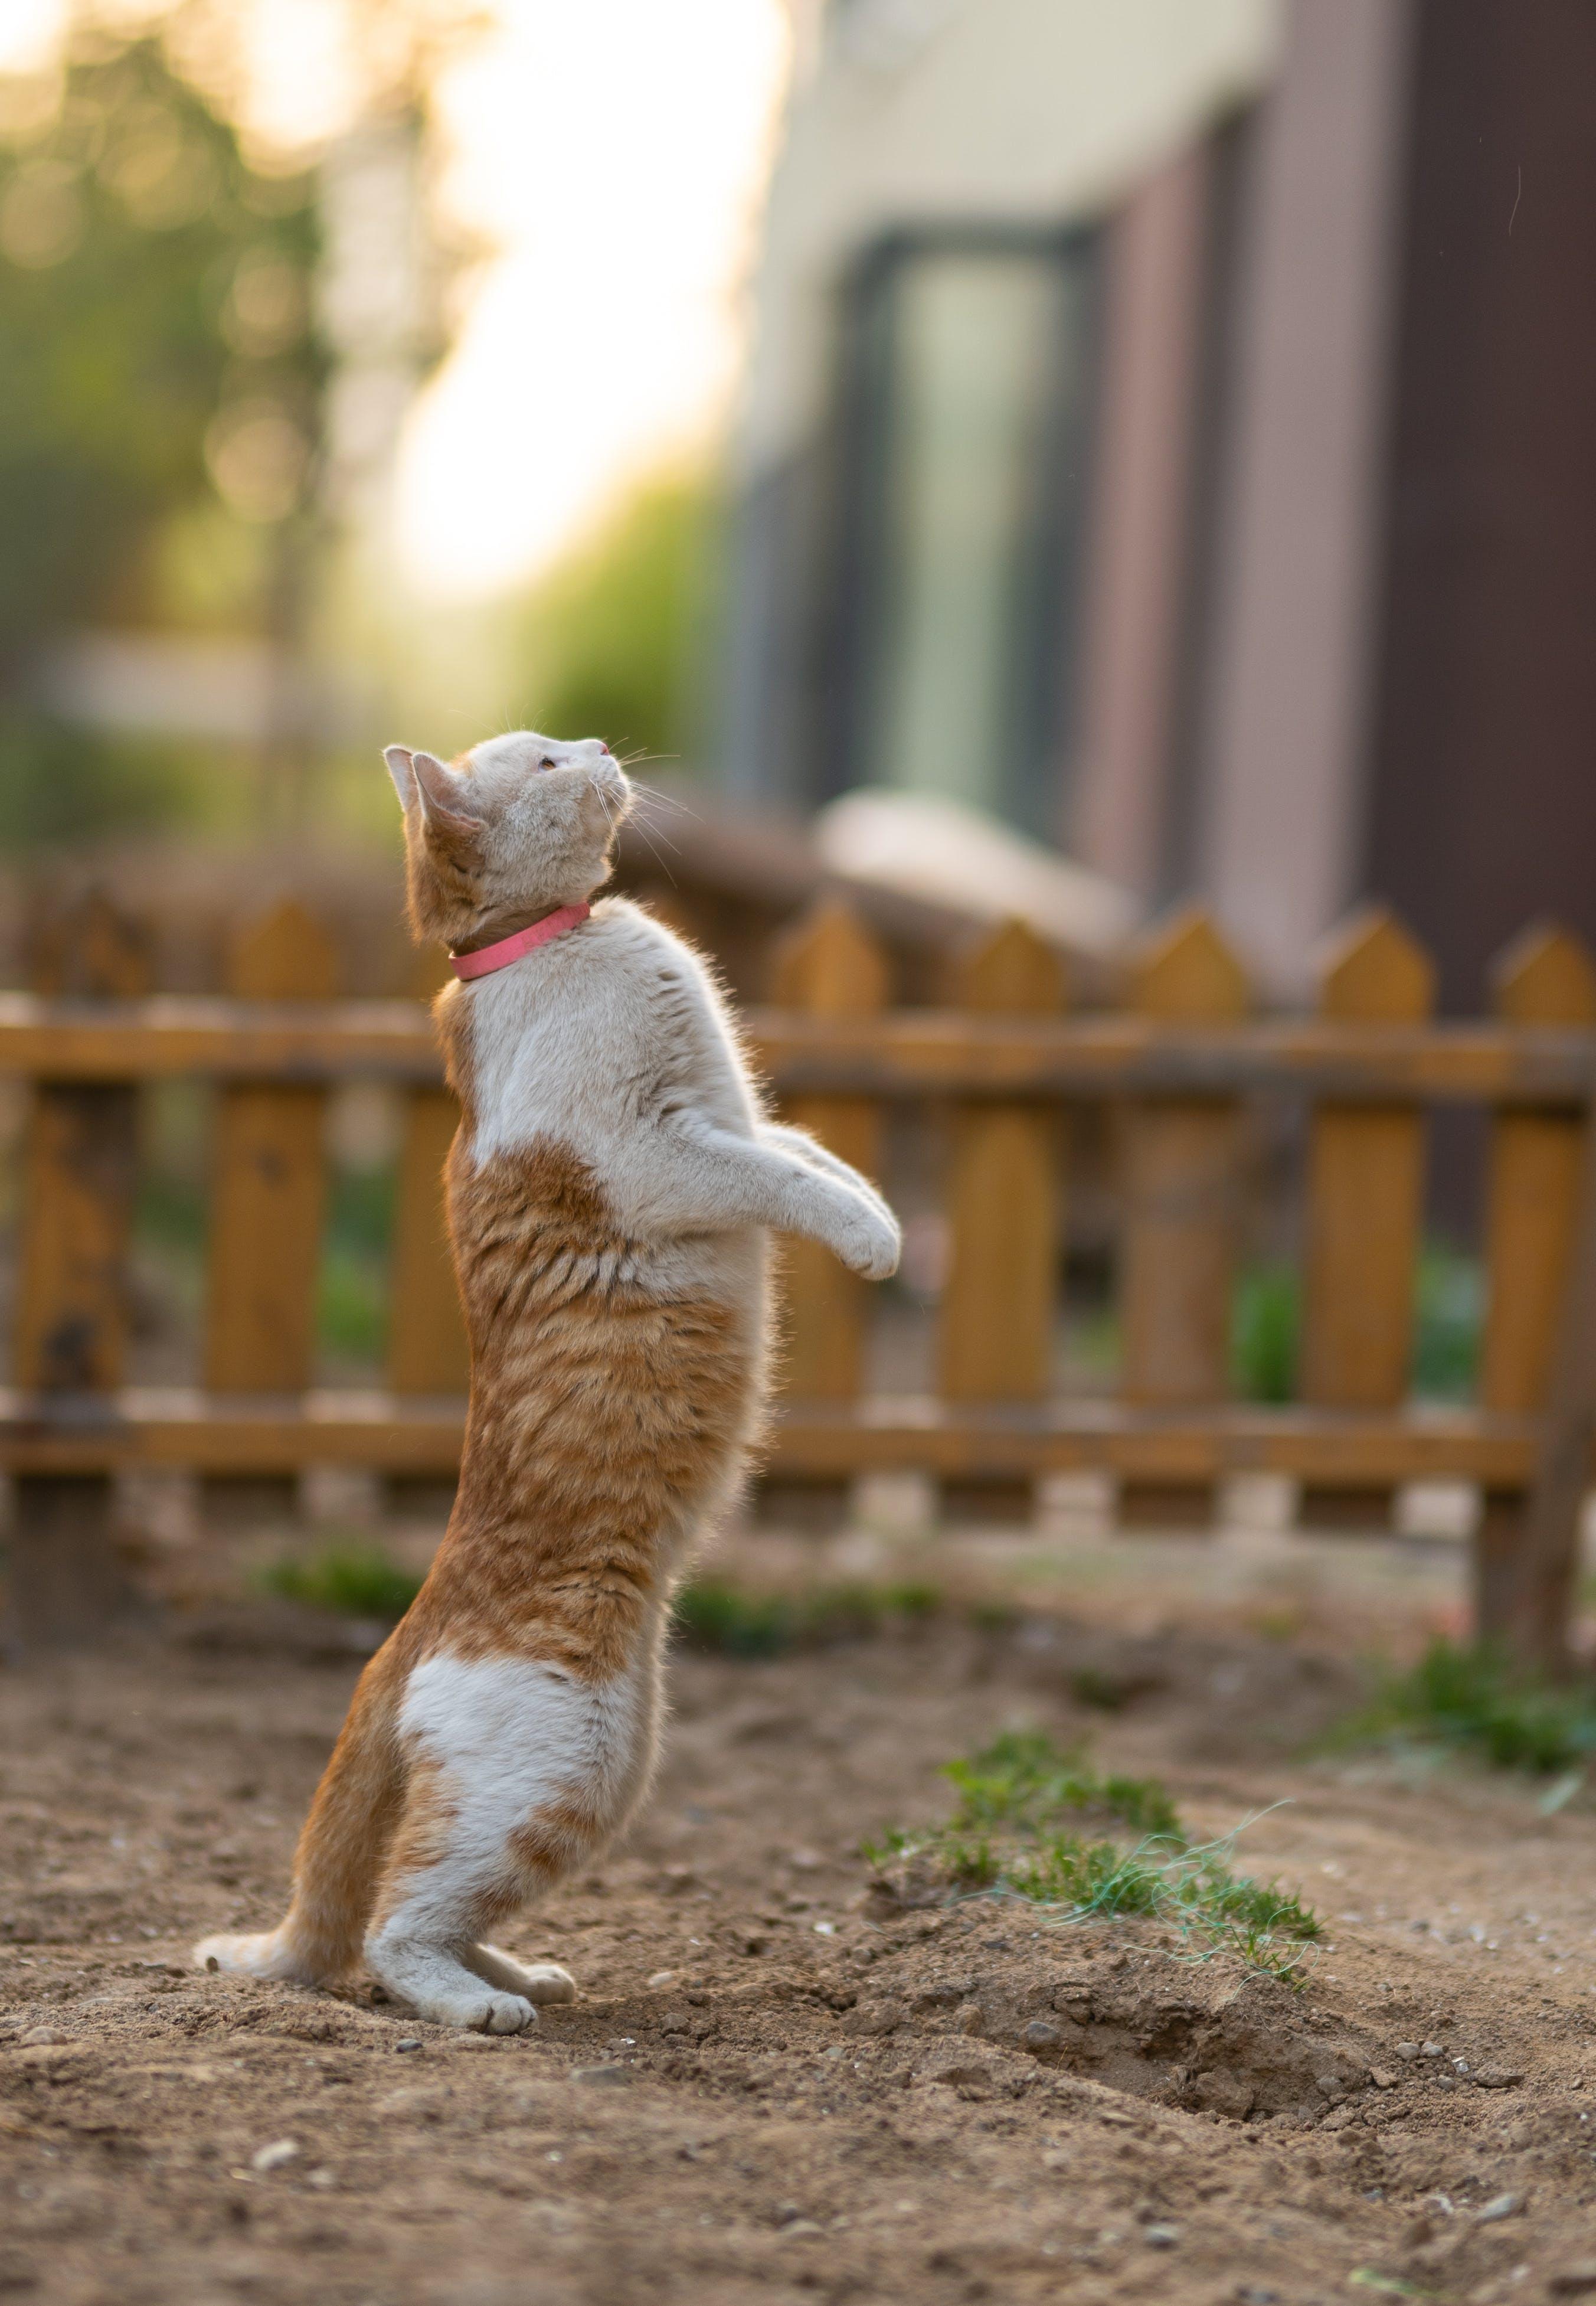 Gratis arkivbilde med bicolor katt